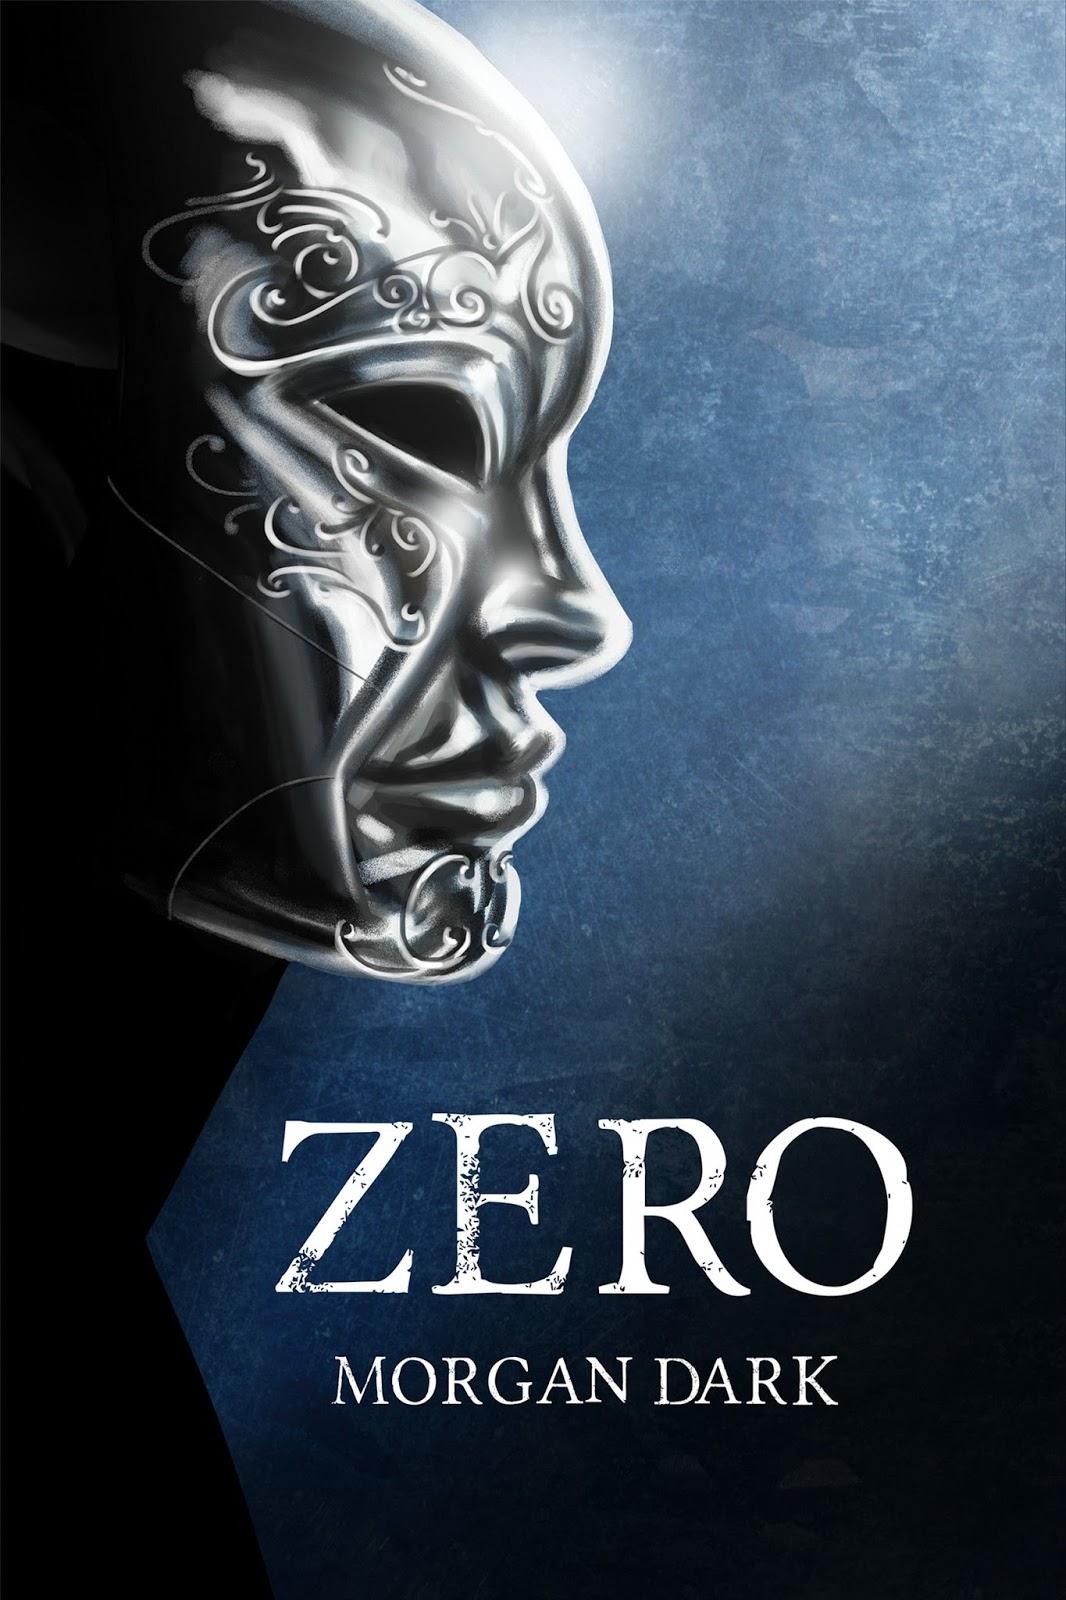 http://lectorlobo.blogspot.com/2016/05/zero-zero-1.html